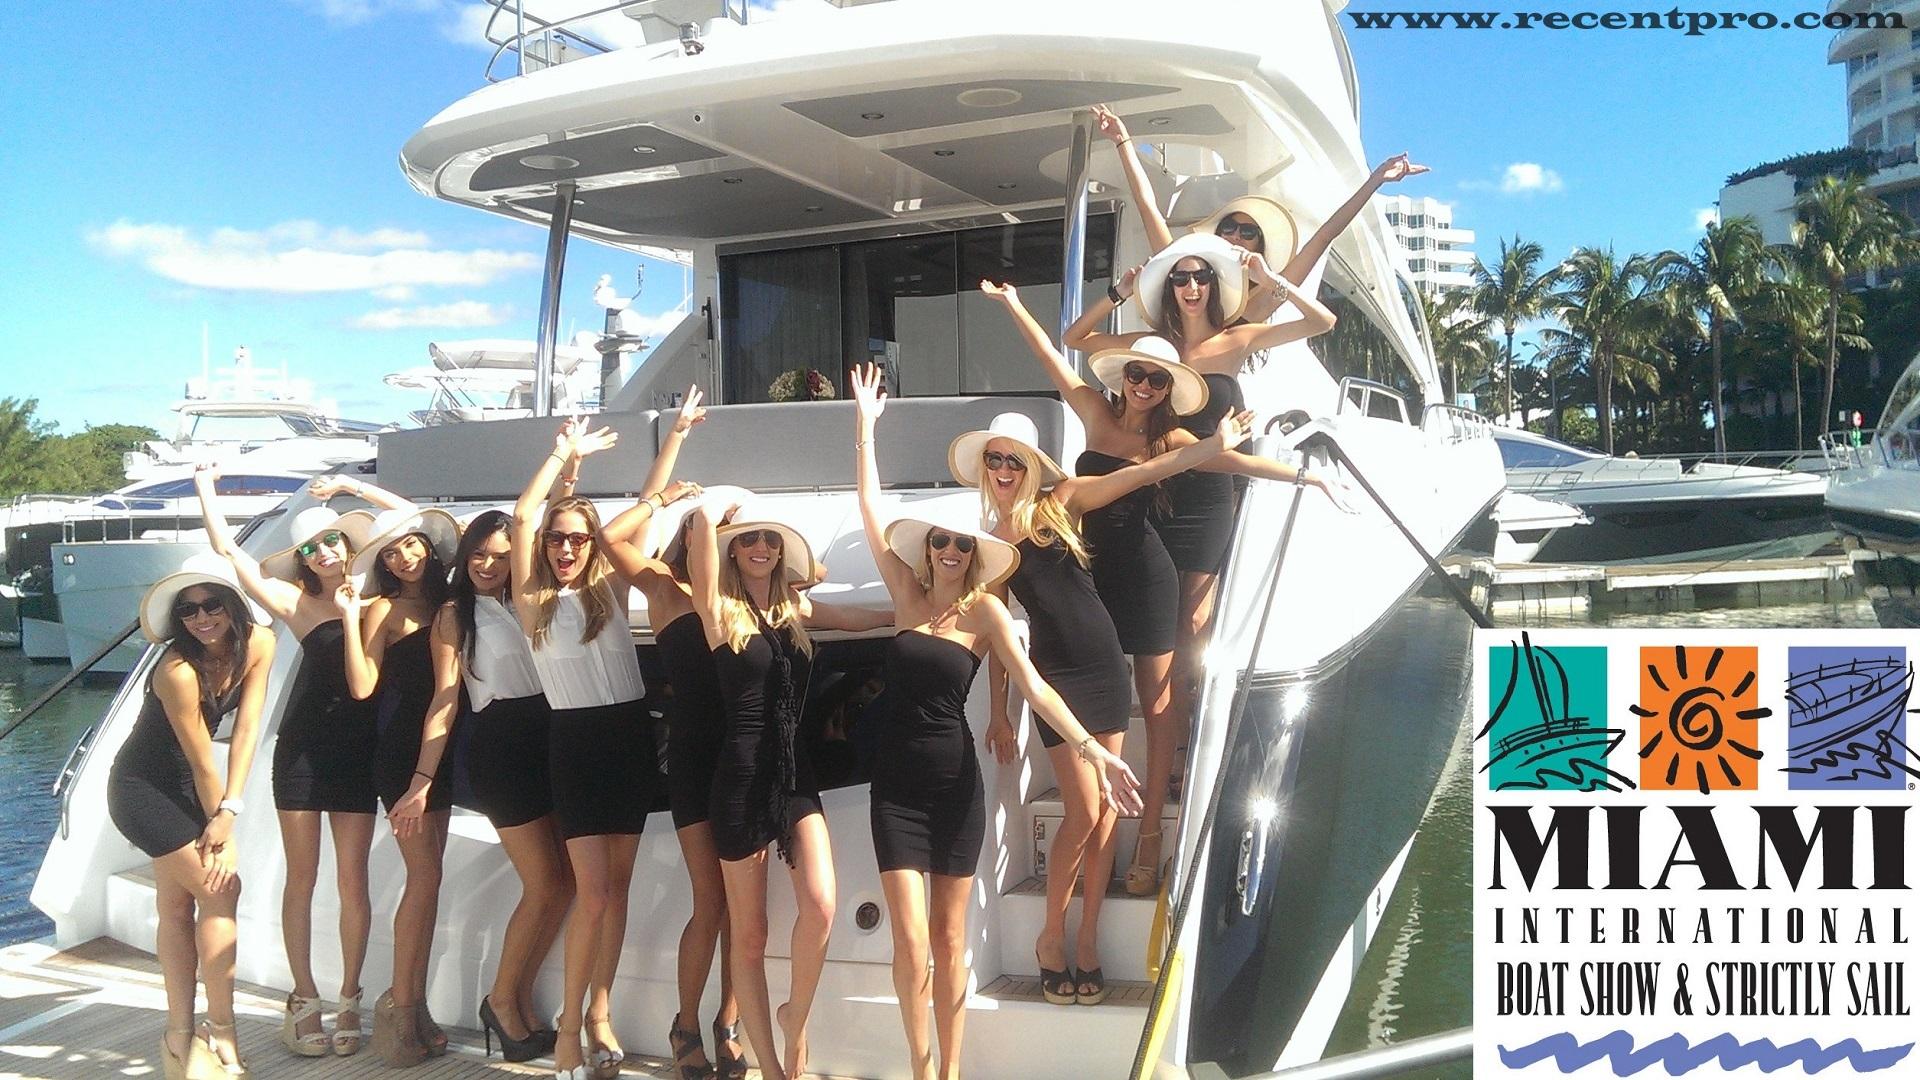 hyavana-live-miami boat show